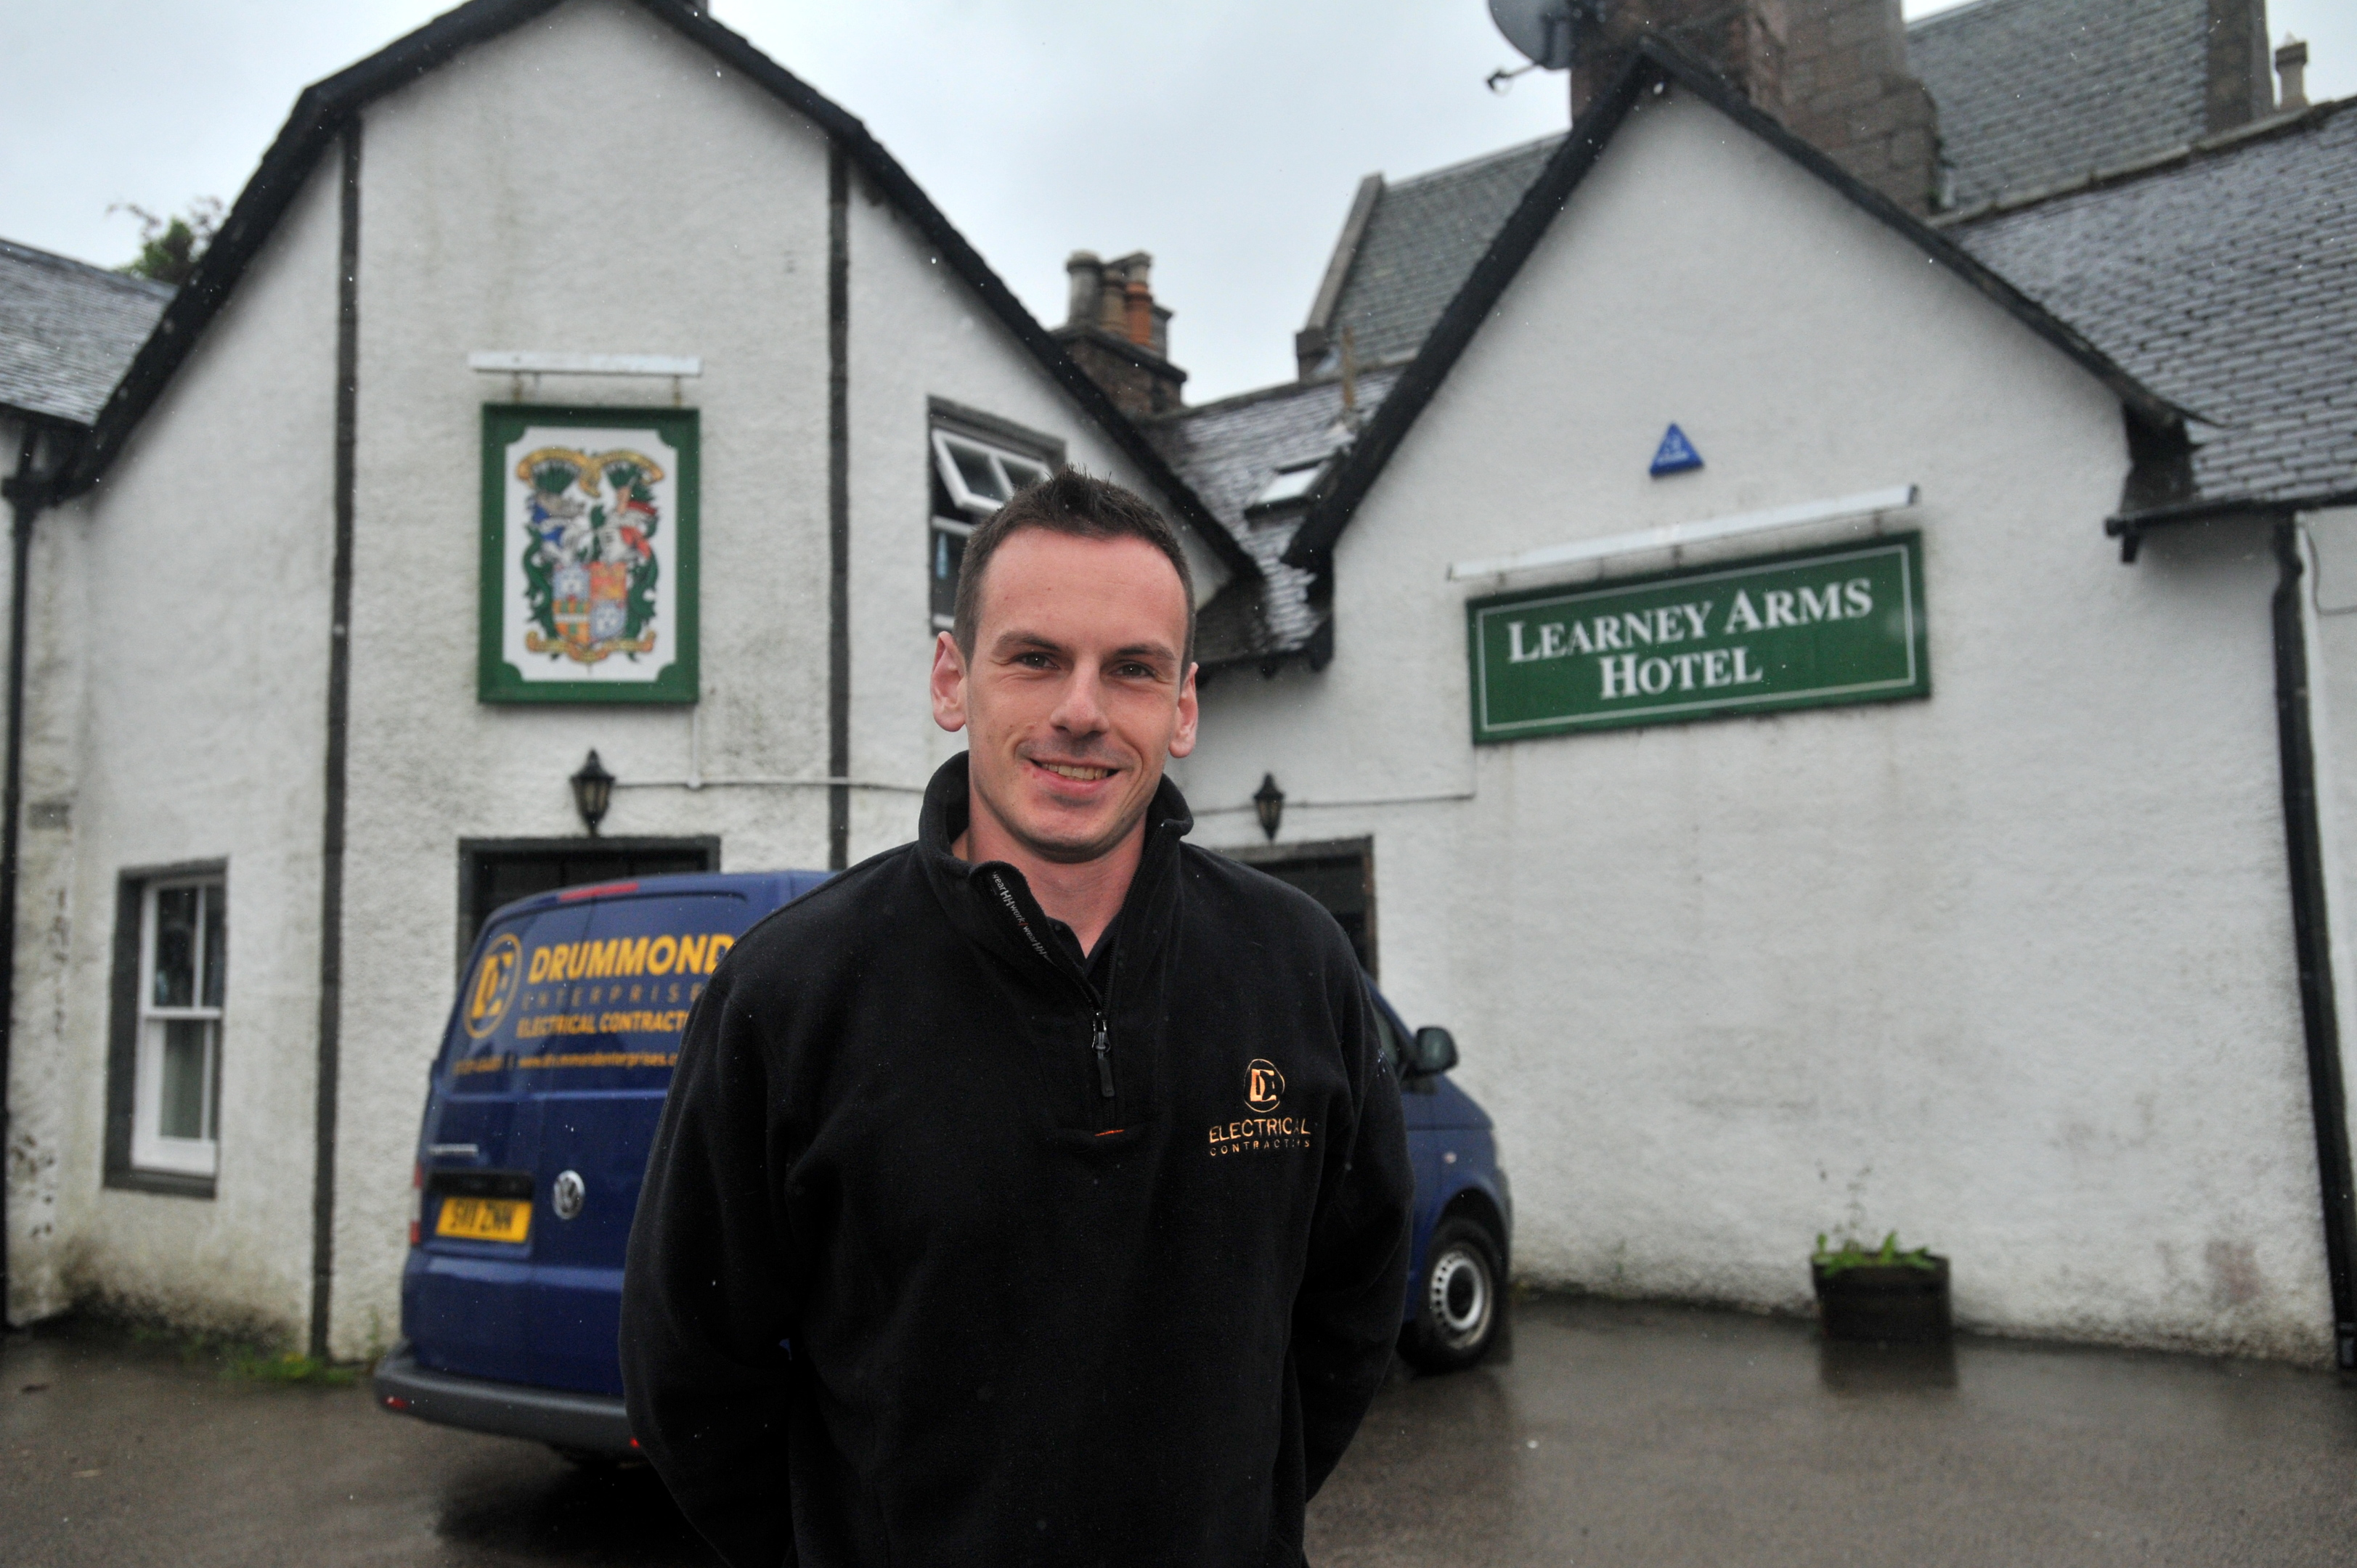 The pub's new owner Thomas Drummond